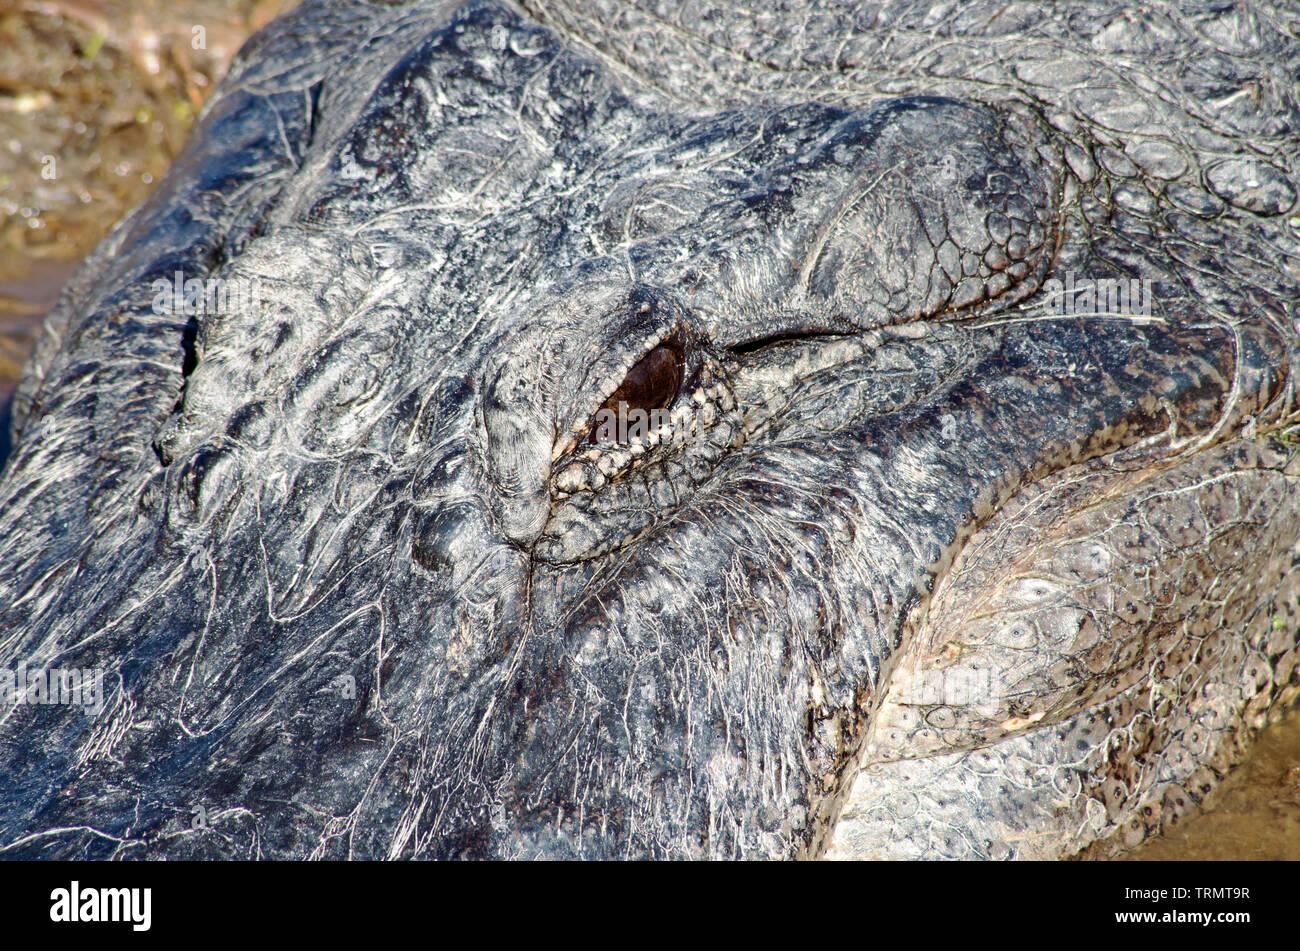 American Alligator head, closeup, from above, at the Leonabelle Turnbull Birding Center in Port Aransas, Texas USA. - Stock Image